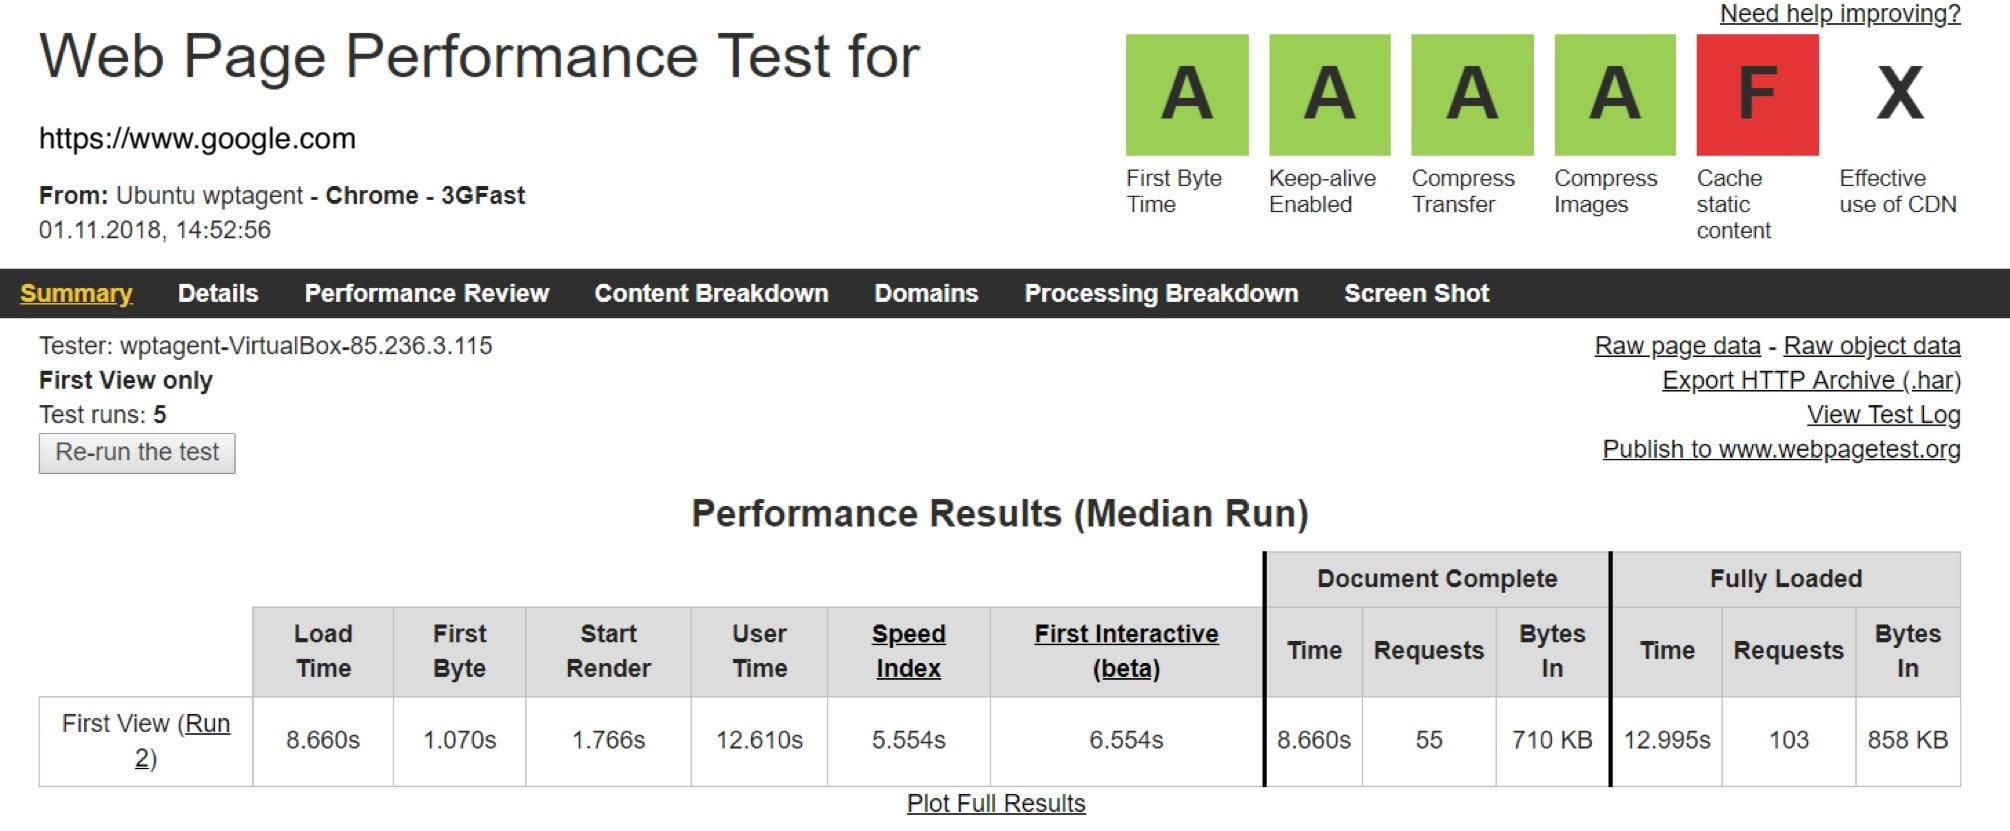 A screenshot of the WebPageTest web interface